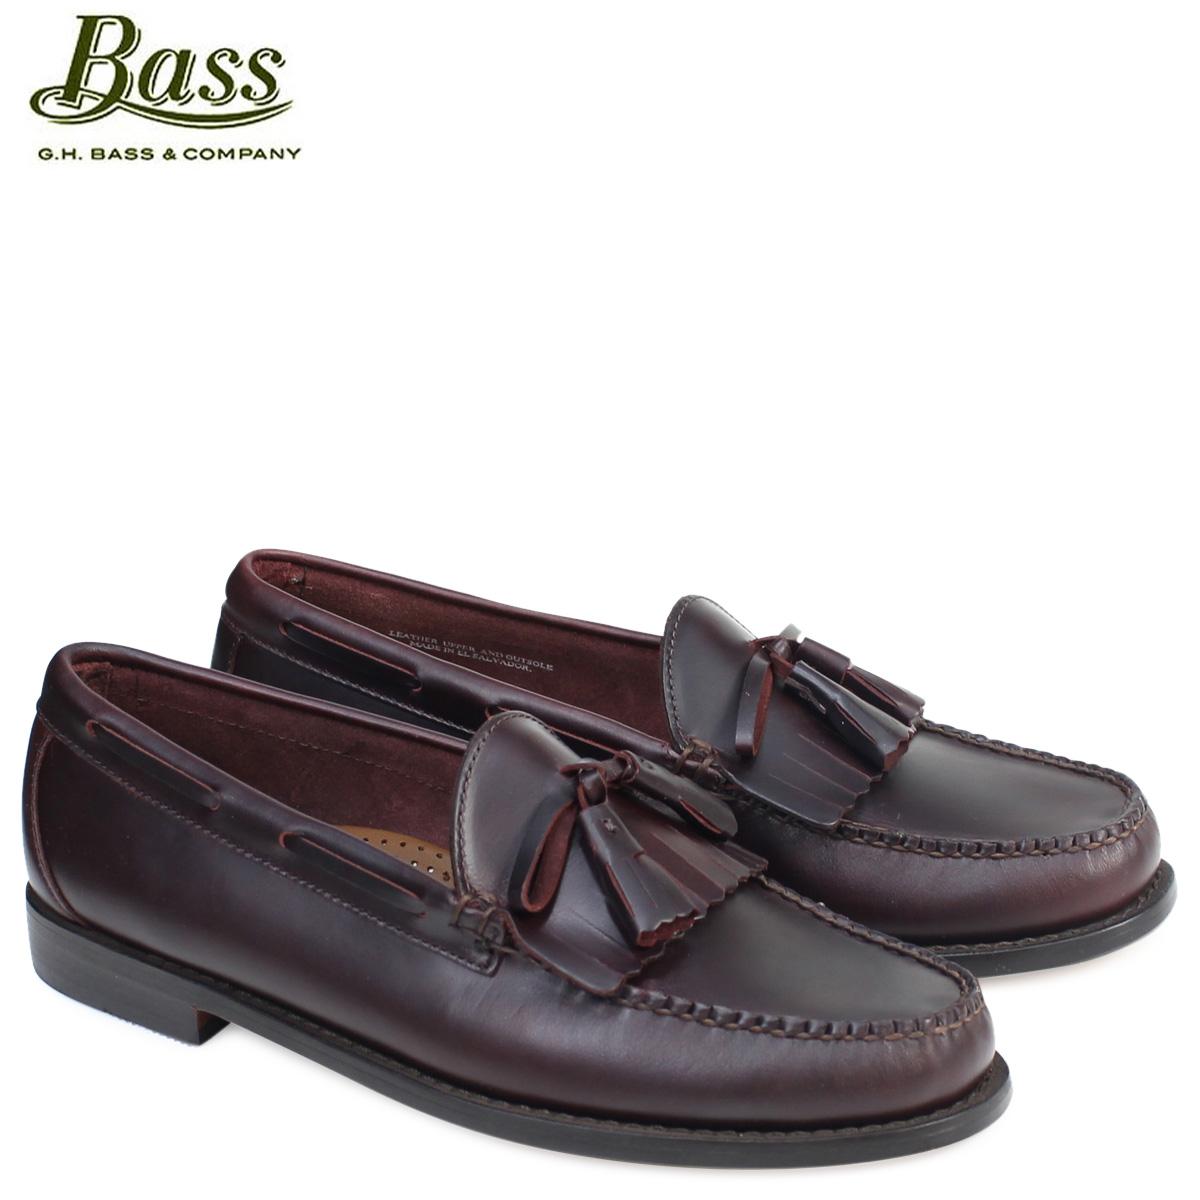 G.H. BASS ジーエイチバス ローファー ジーエイチバス メンズ タッセル LAWRENCE 70-80918 KILTIE WEEJUNS バーガンディ 70-80918 バーガンディ, オマケ des shoes and bag:390a4b51 --- ww.thecollagist.com